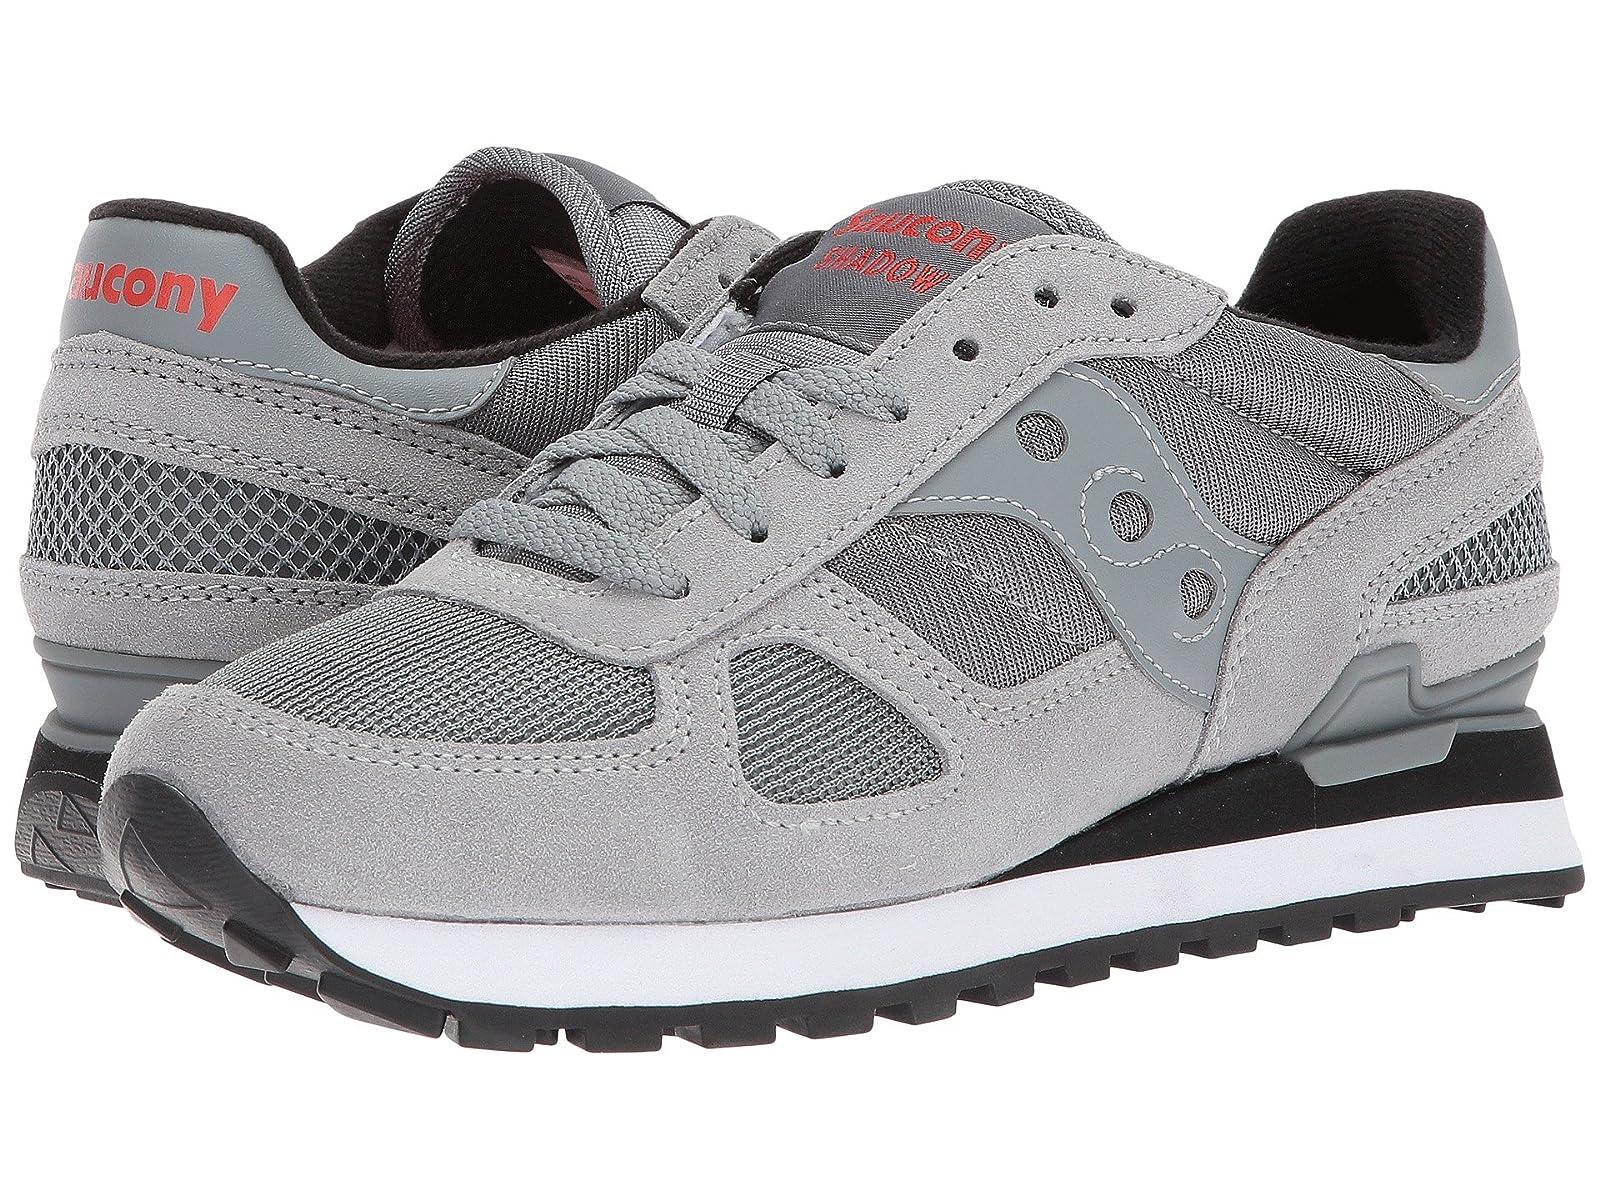 Saucony Originals Shadow OriginalAtmospheric grades have affordable shoes